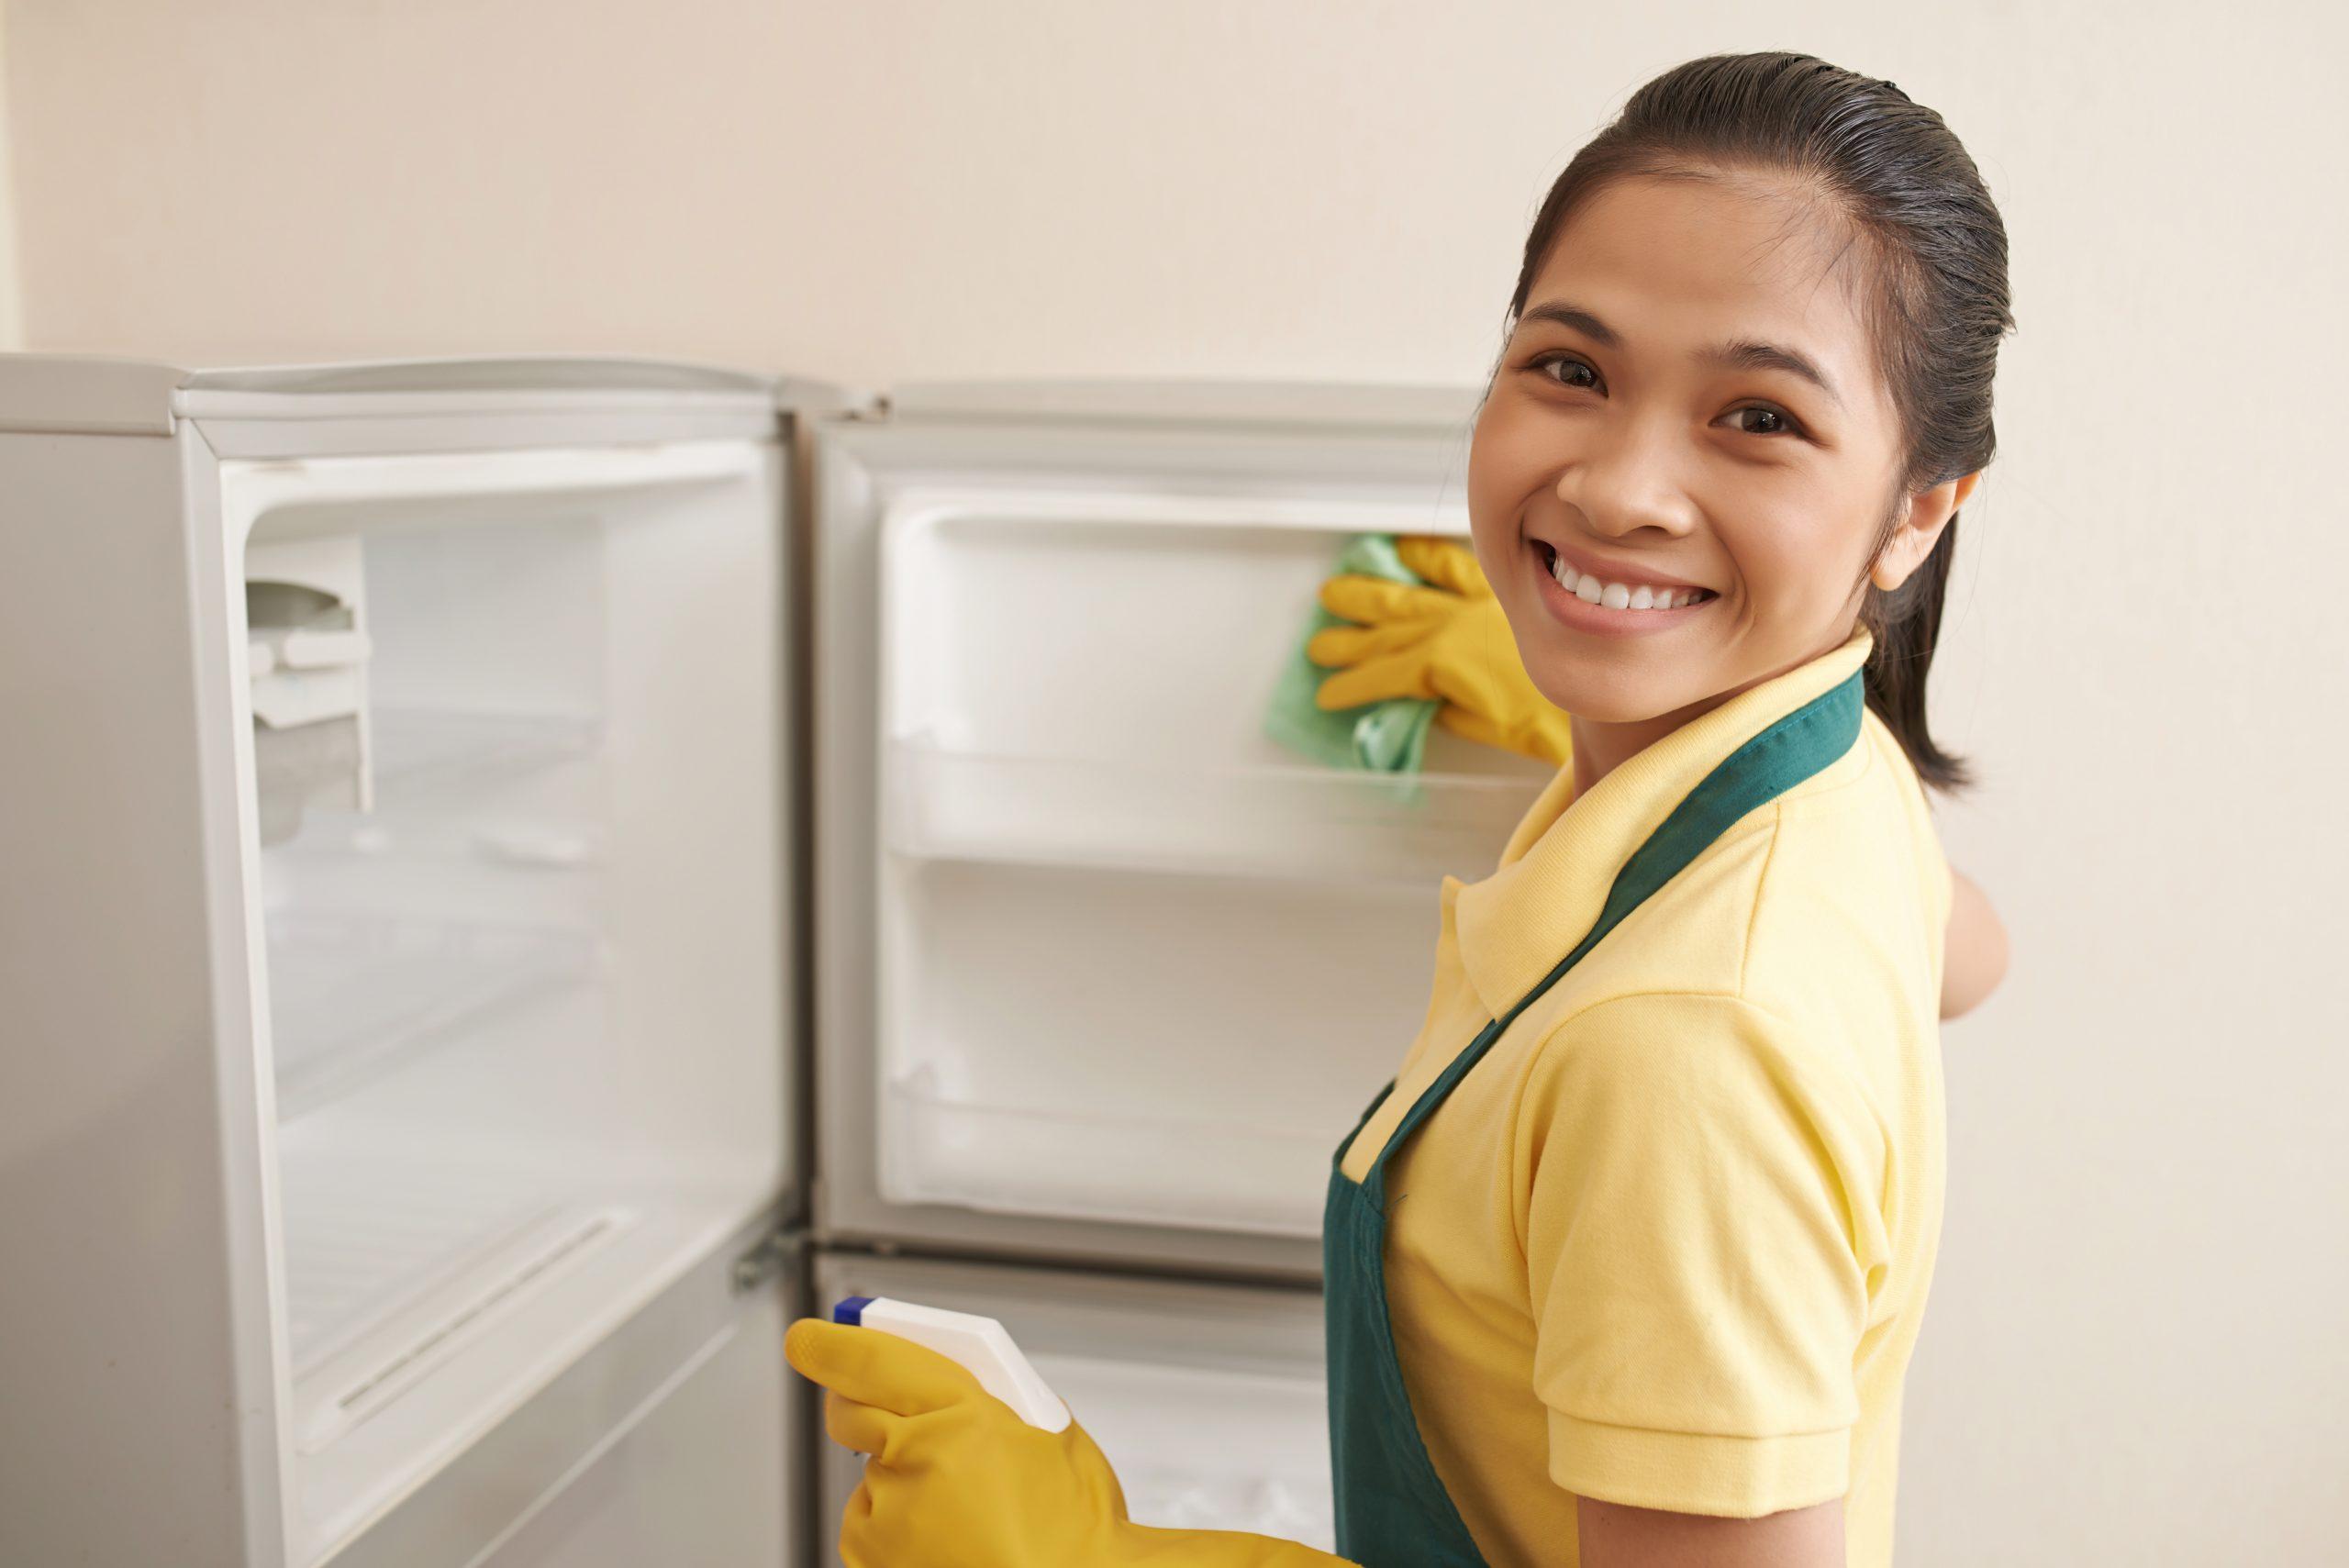 Filipino maid agency Singapore Image 1